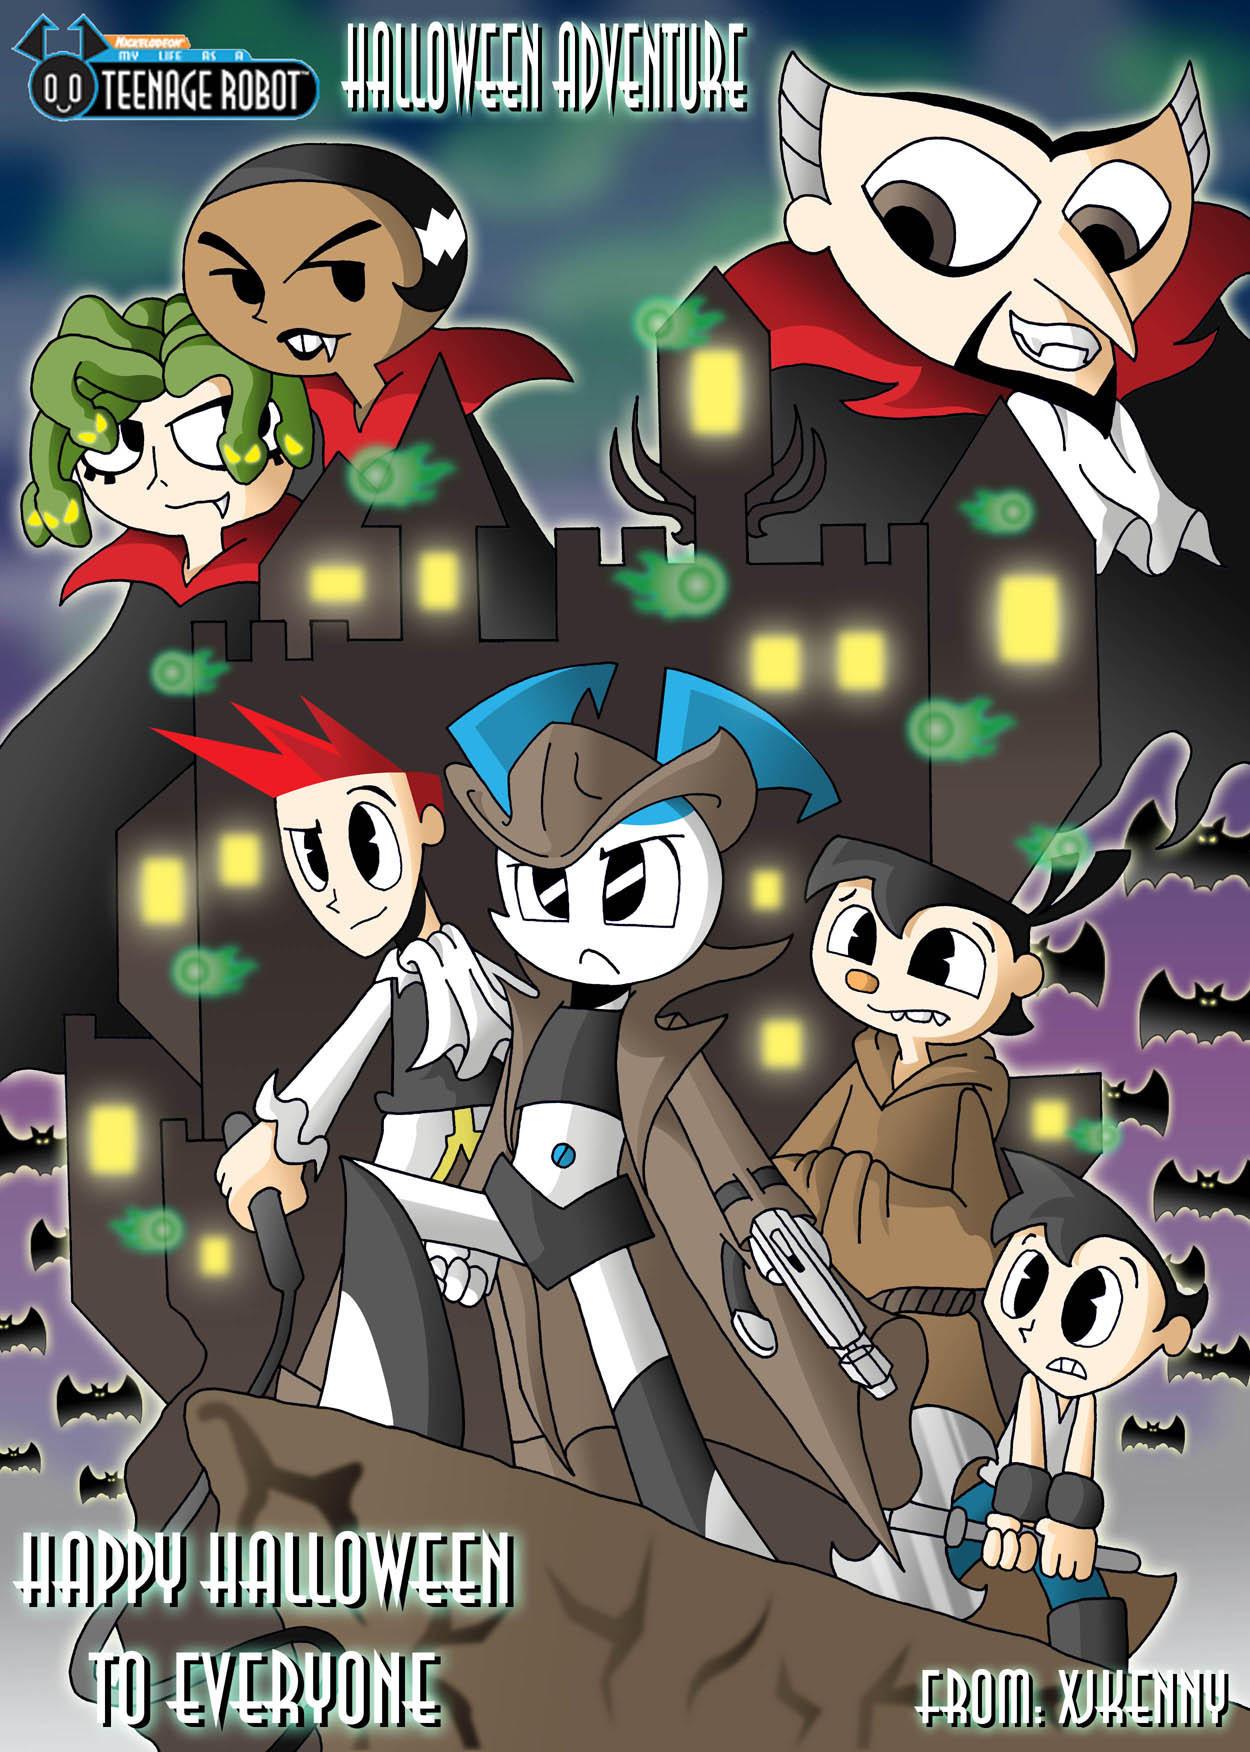 MLAATR Halloween Adventure by XJKenny on DeviantArt